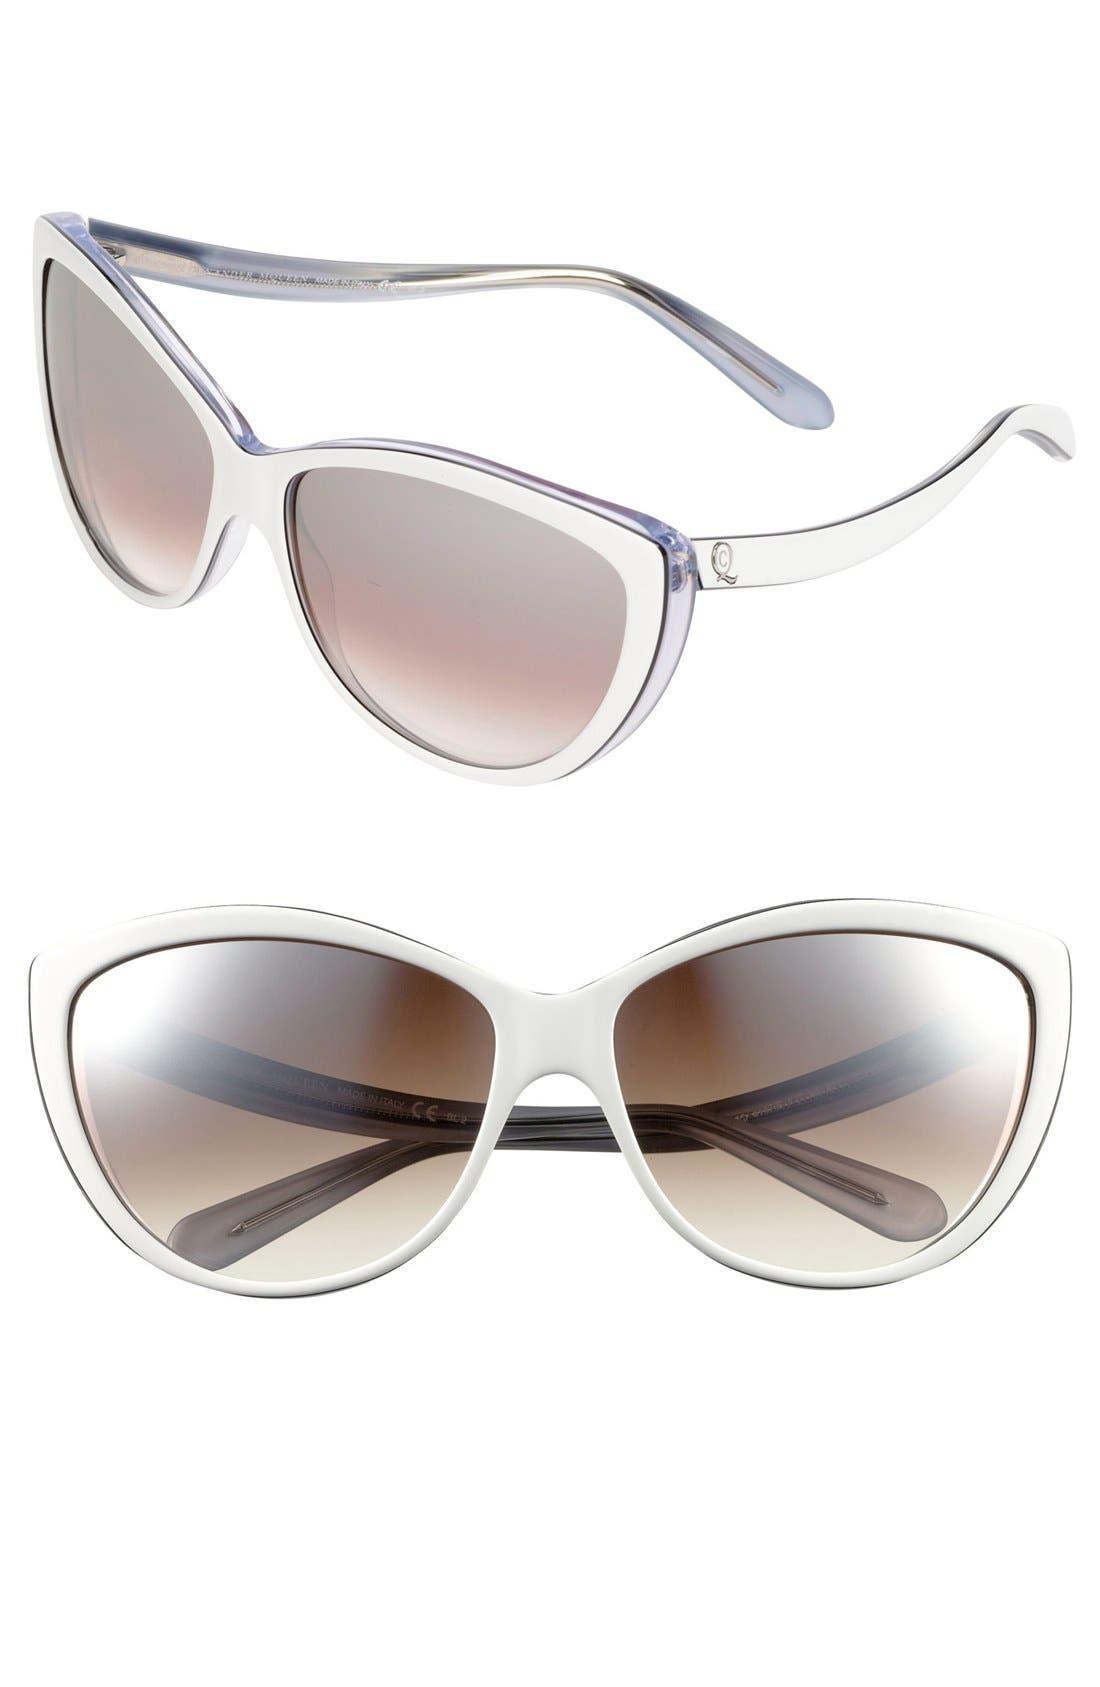 61mm Two-Tone Cat Eye Sunglasses,                             Main thumbnail 4, color,